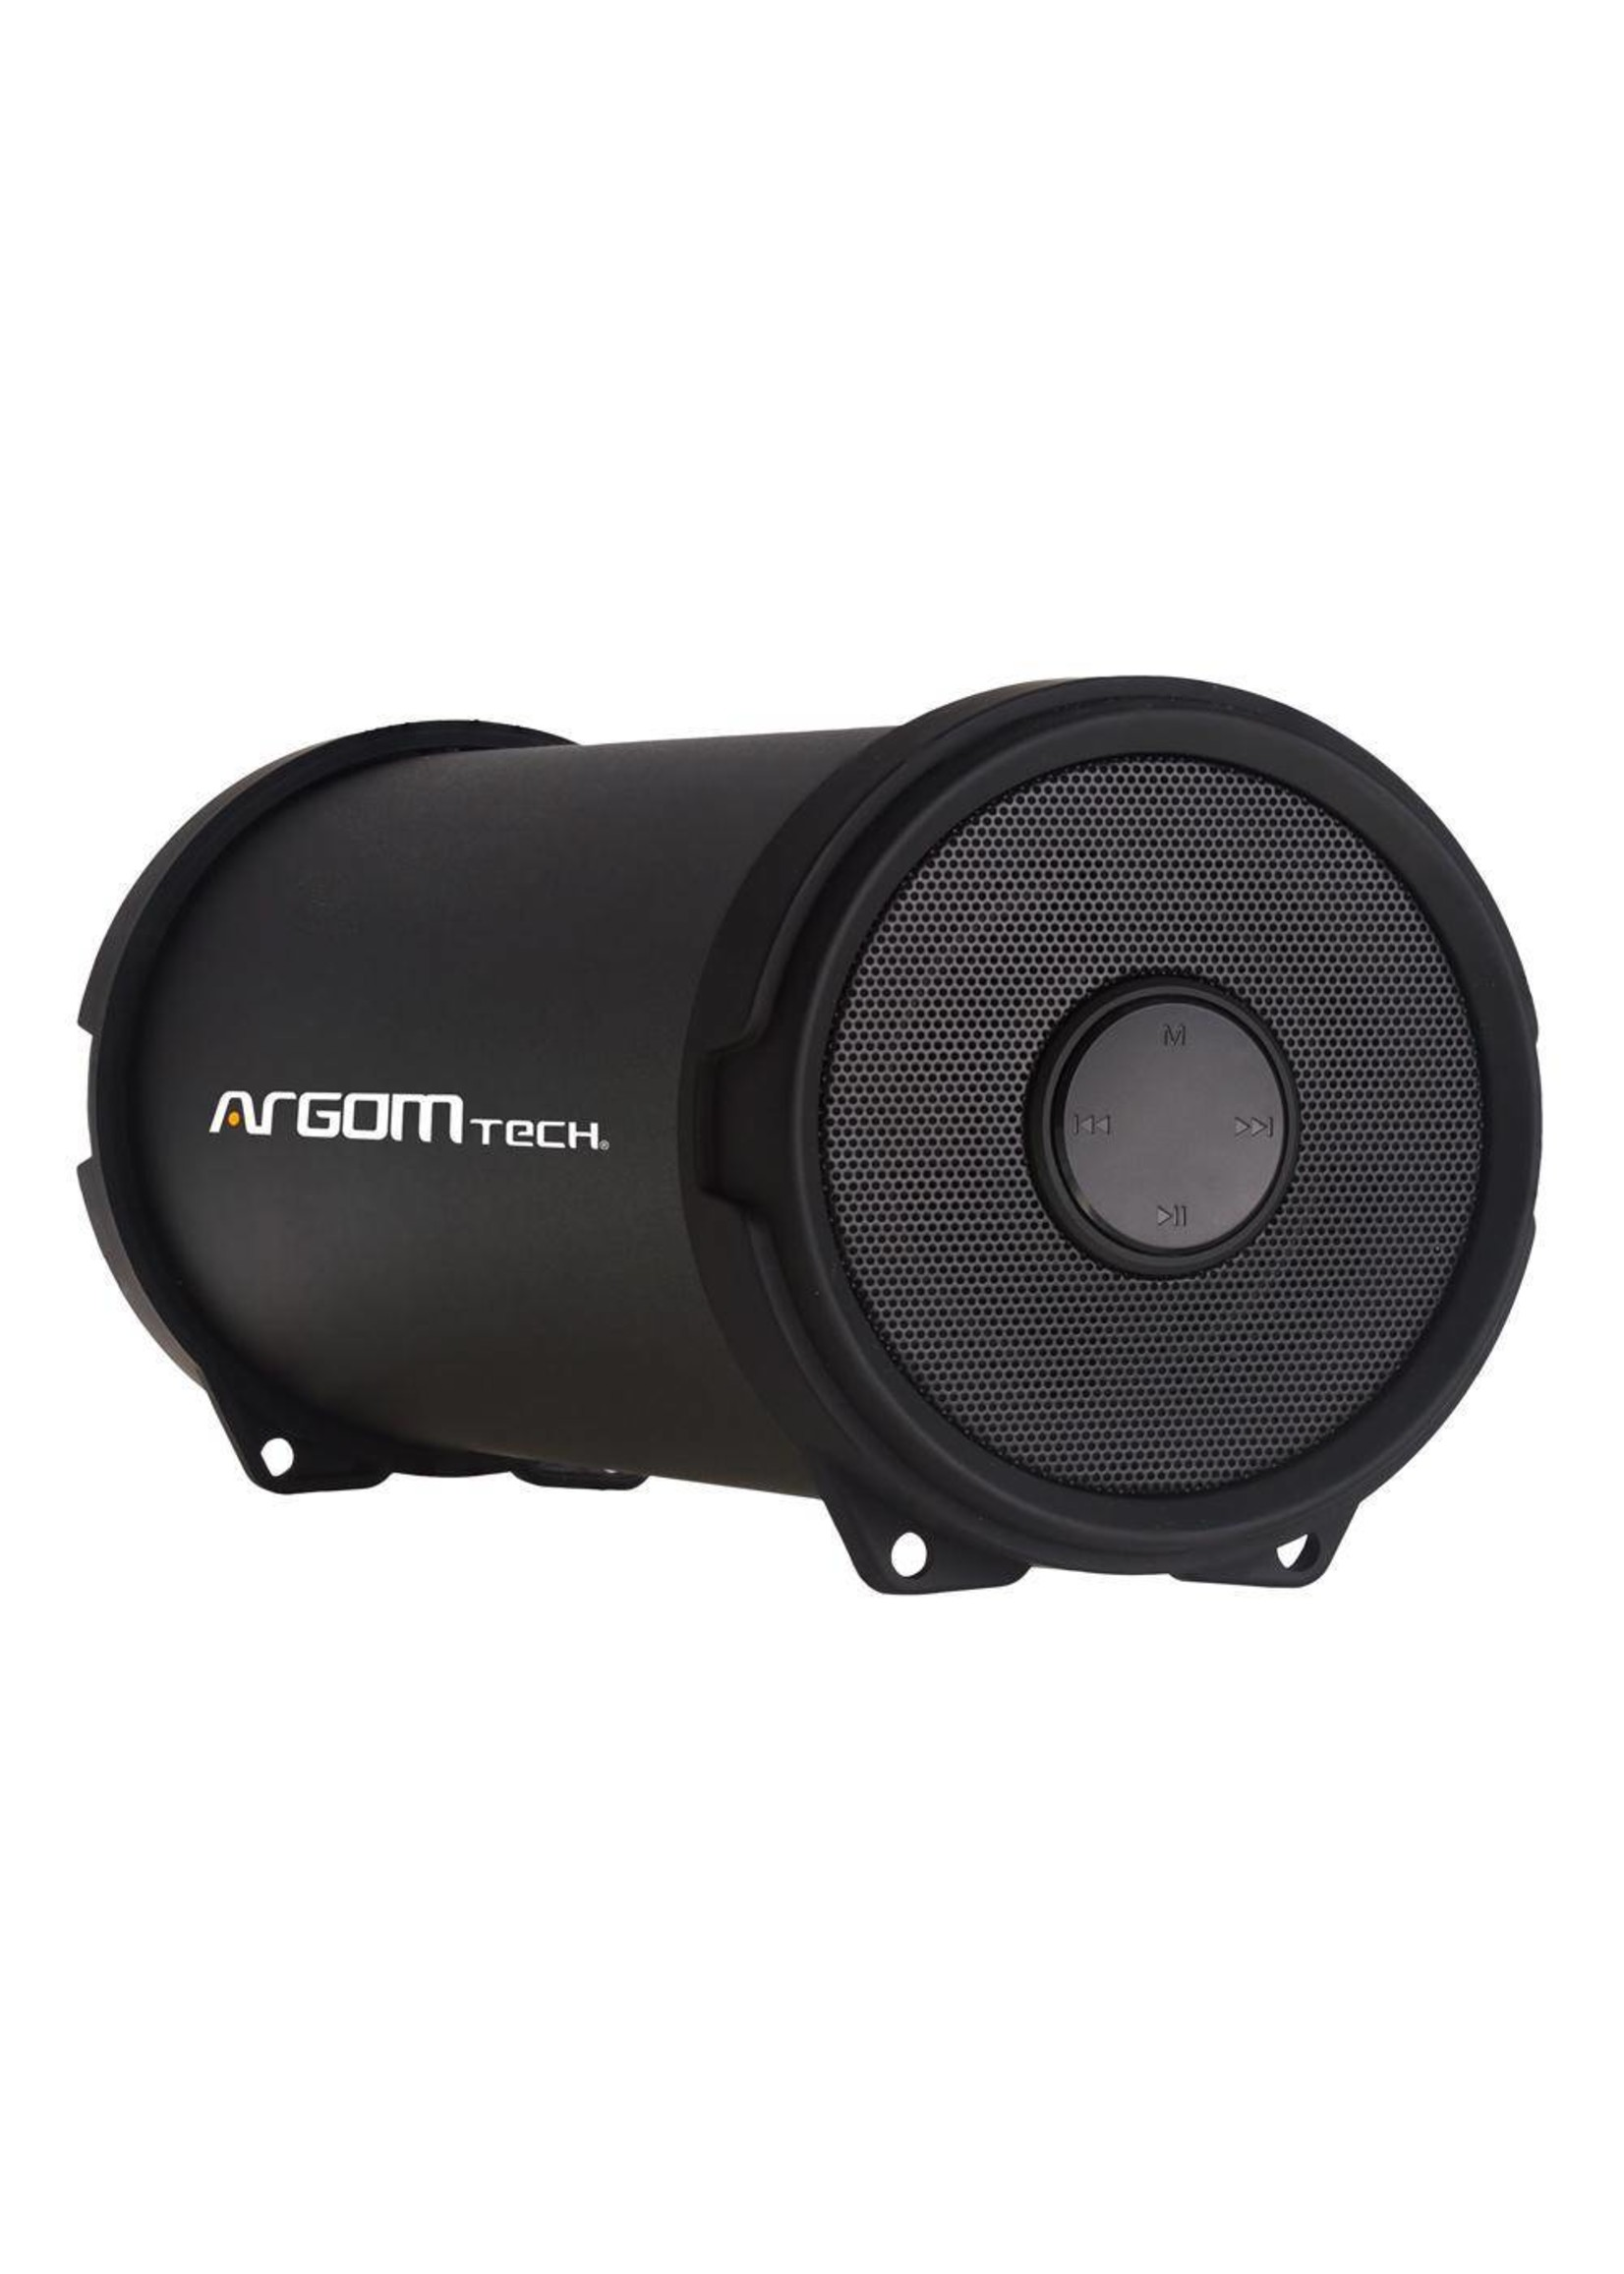 Argom Tech Bluetooth Bazooka Air Beats Argom Speaker